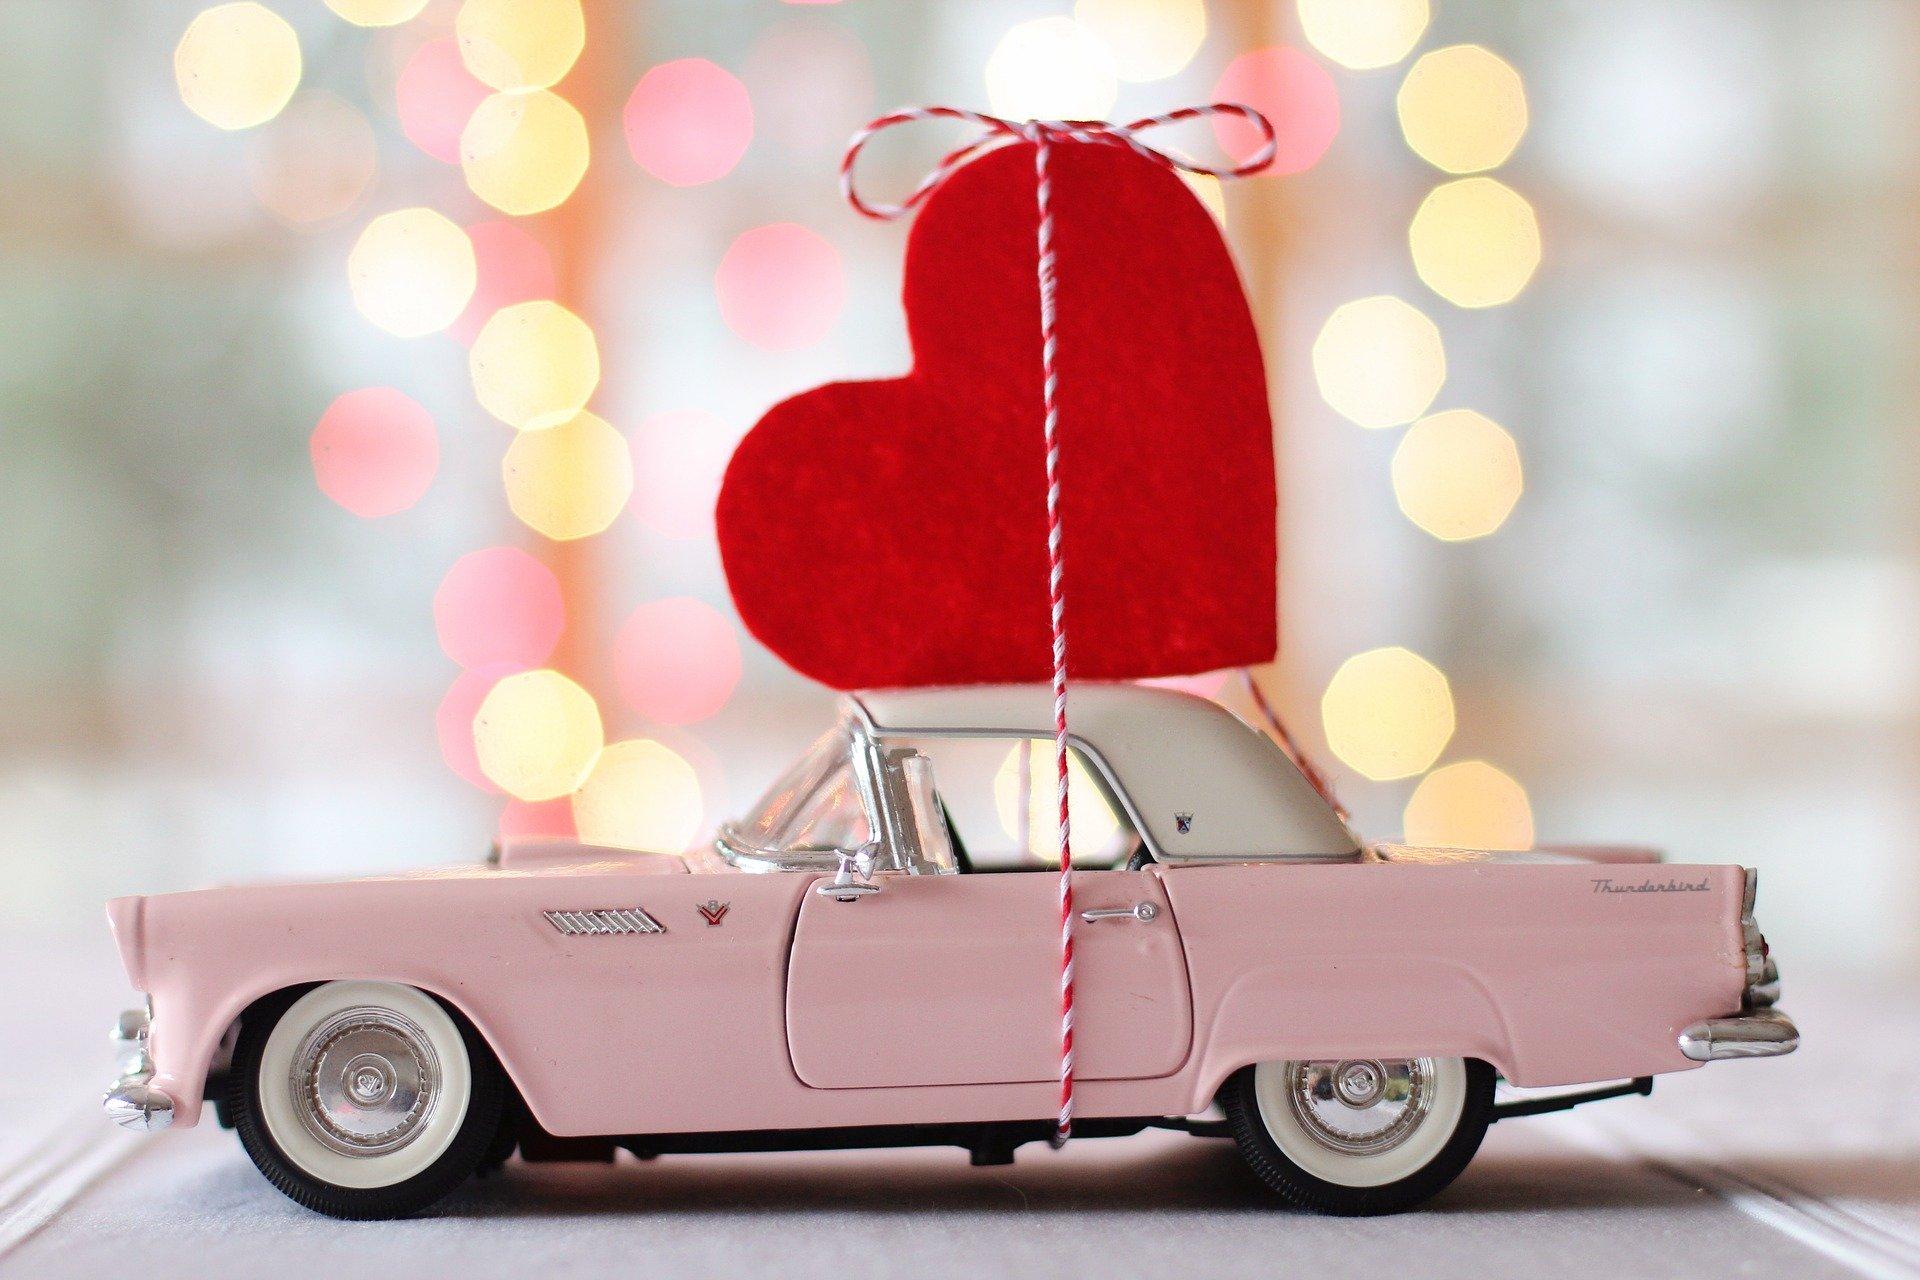 Valentines day car .jpg (263 KB)